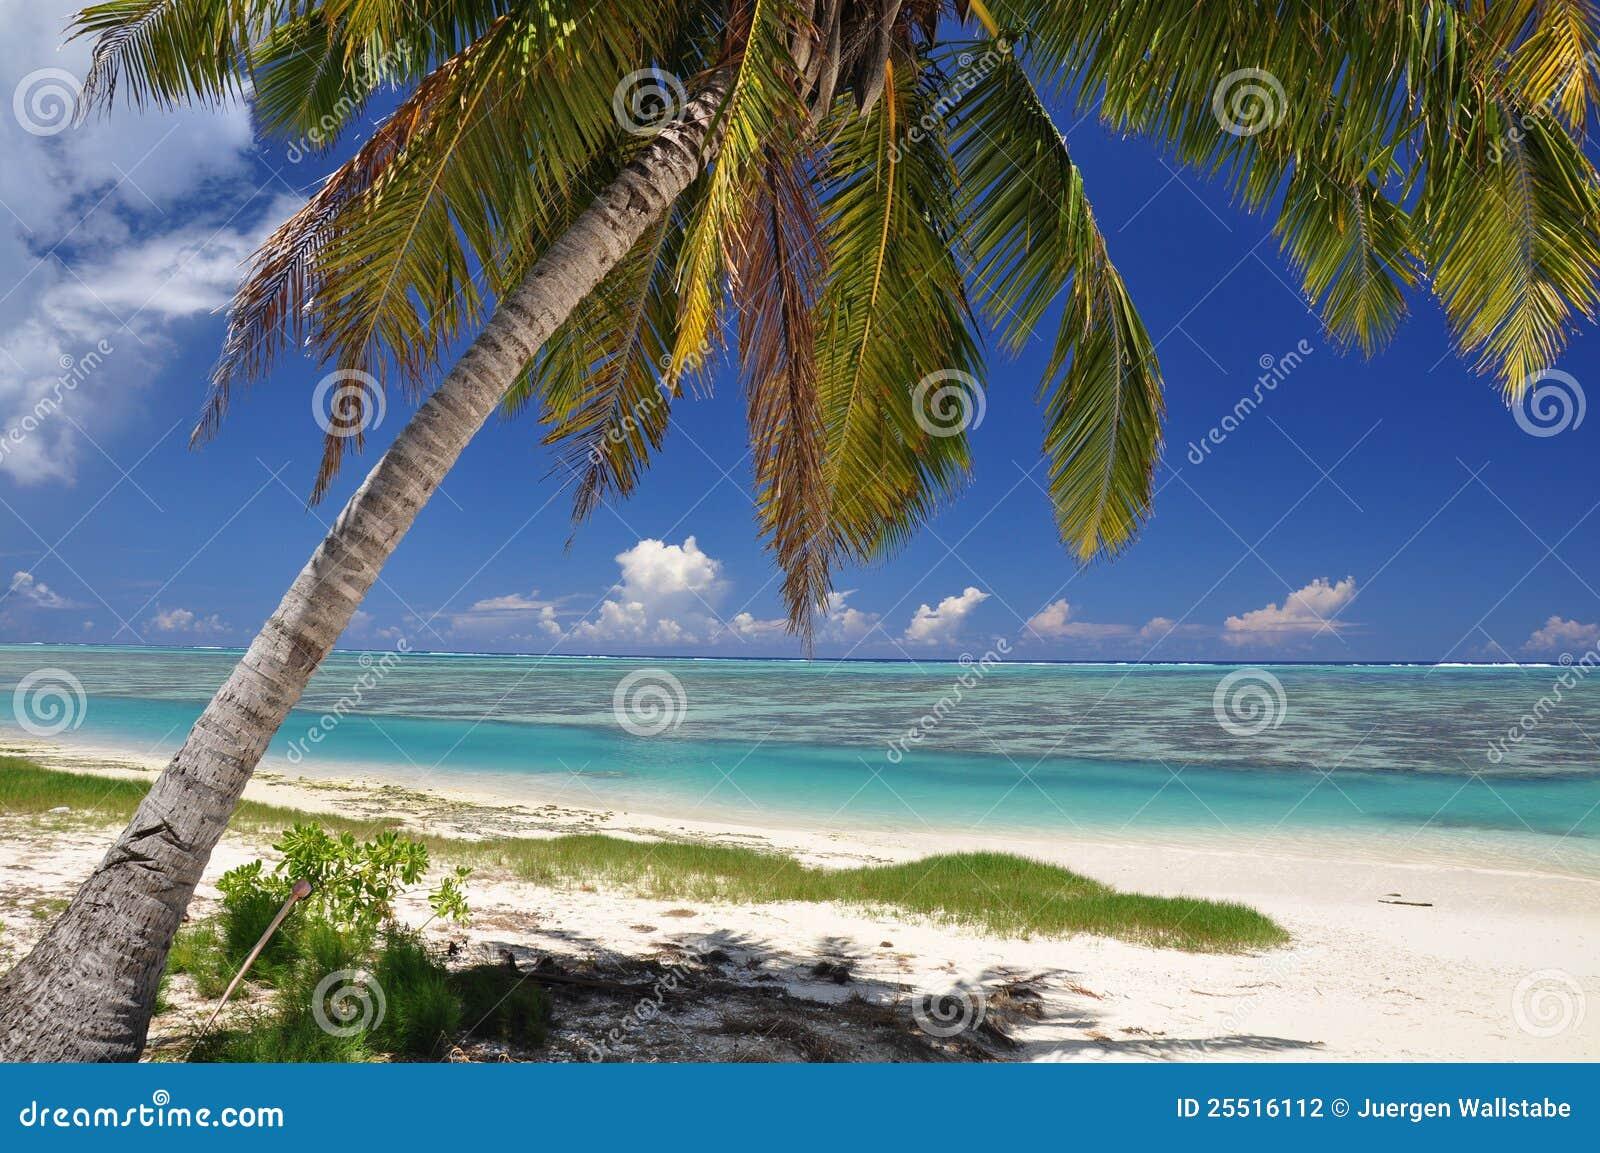 Palme auf Aitutaki - Koch-Inseln